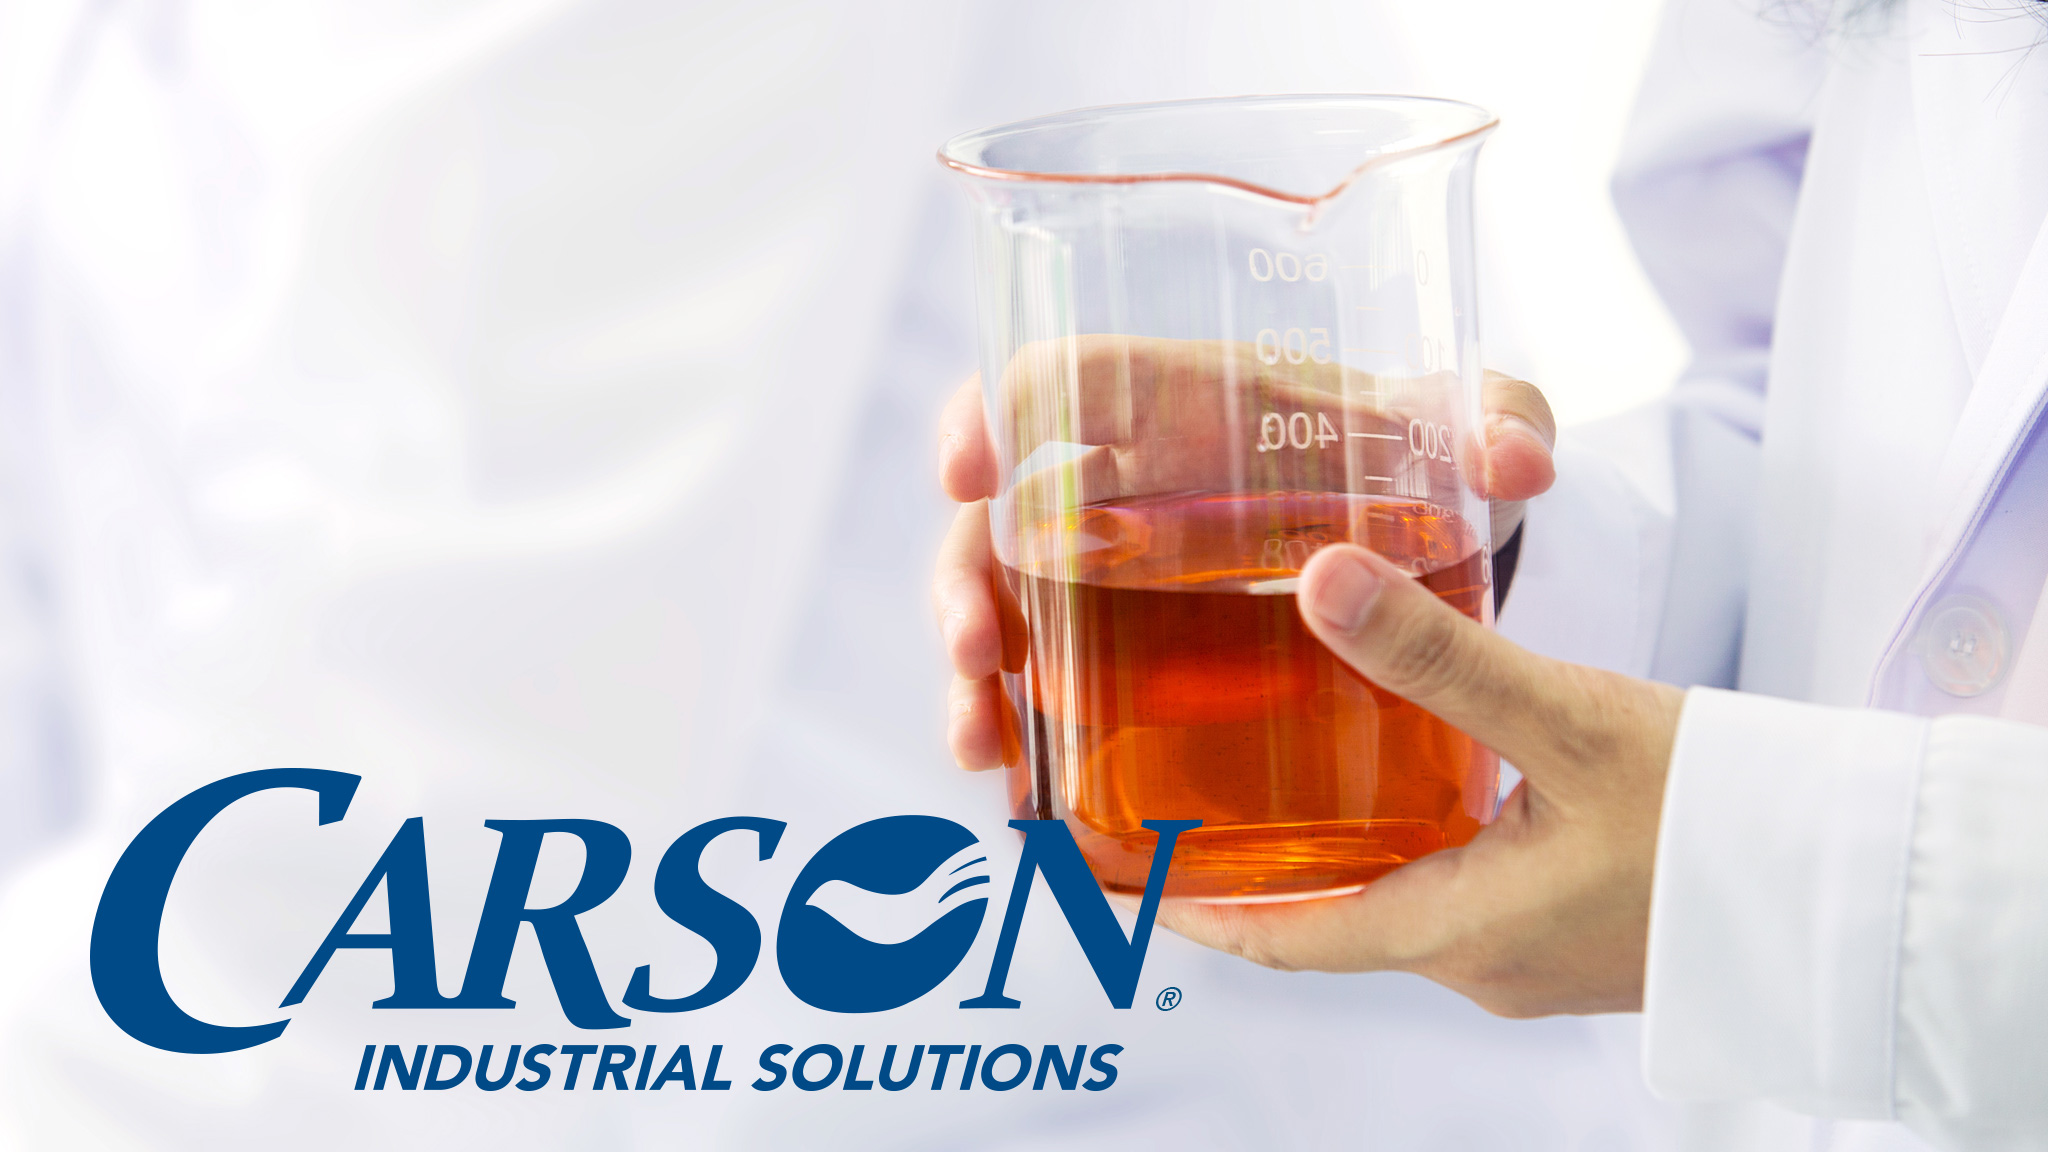 carson industrial solutions web slider